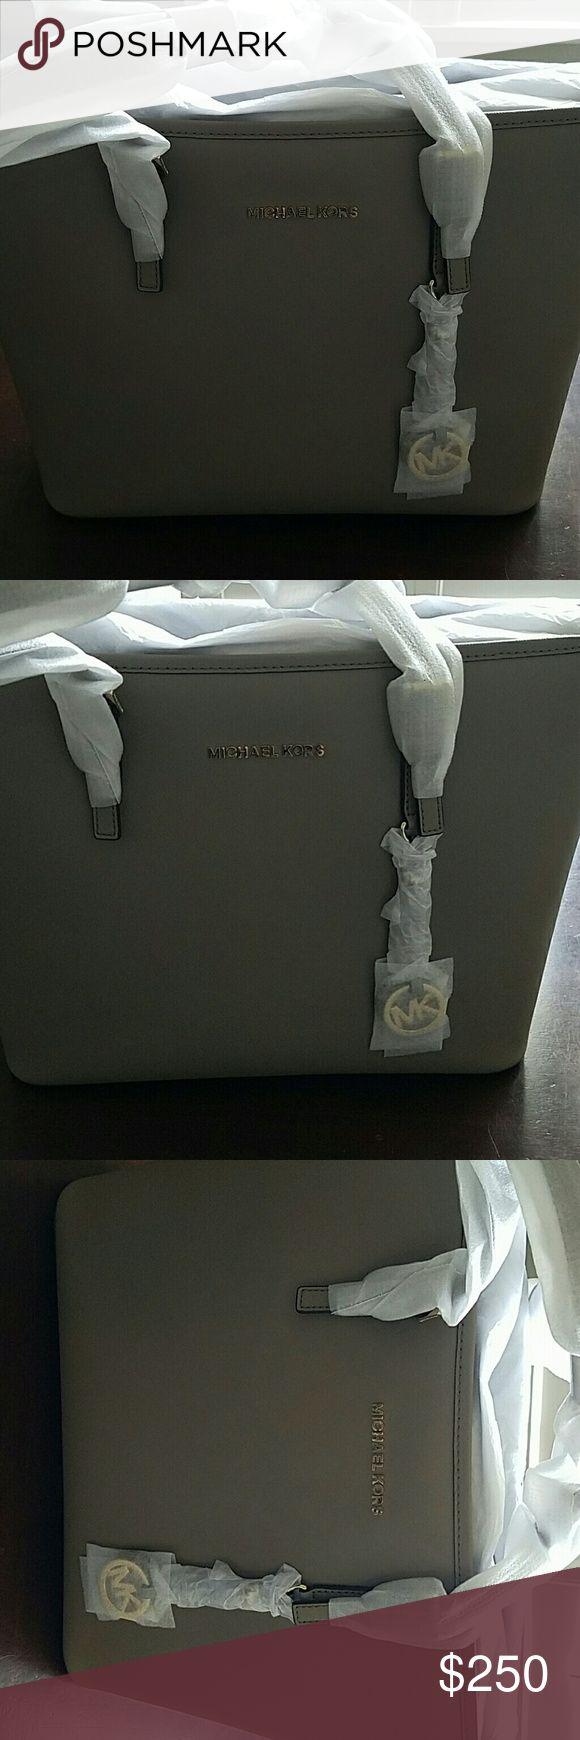 Micheal Kors jet set tote. Brand new with tags  Michael kors Handbag  Never used  Retails for $278. Michael Kors Bags Totes